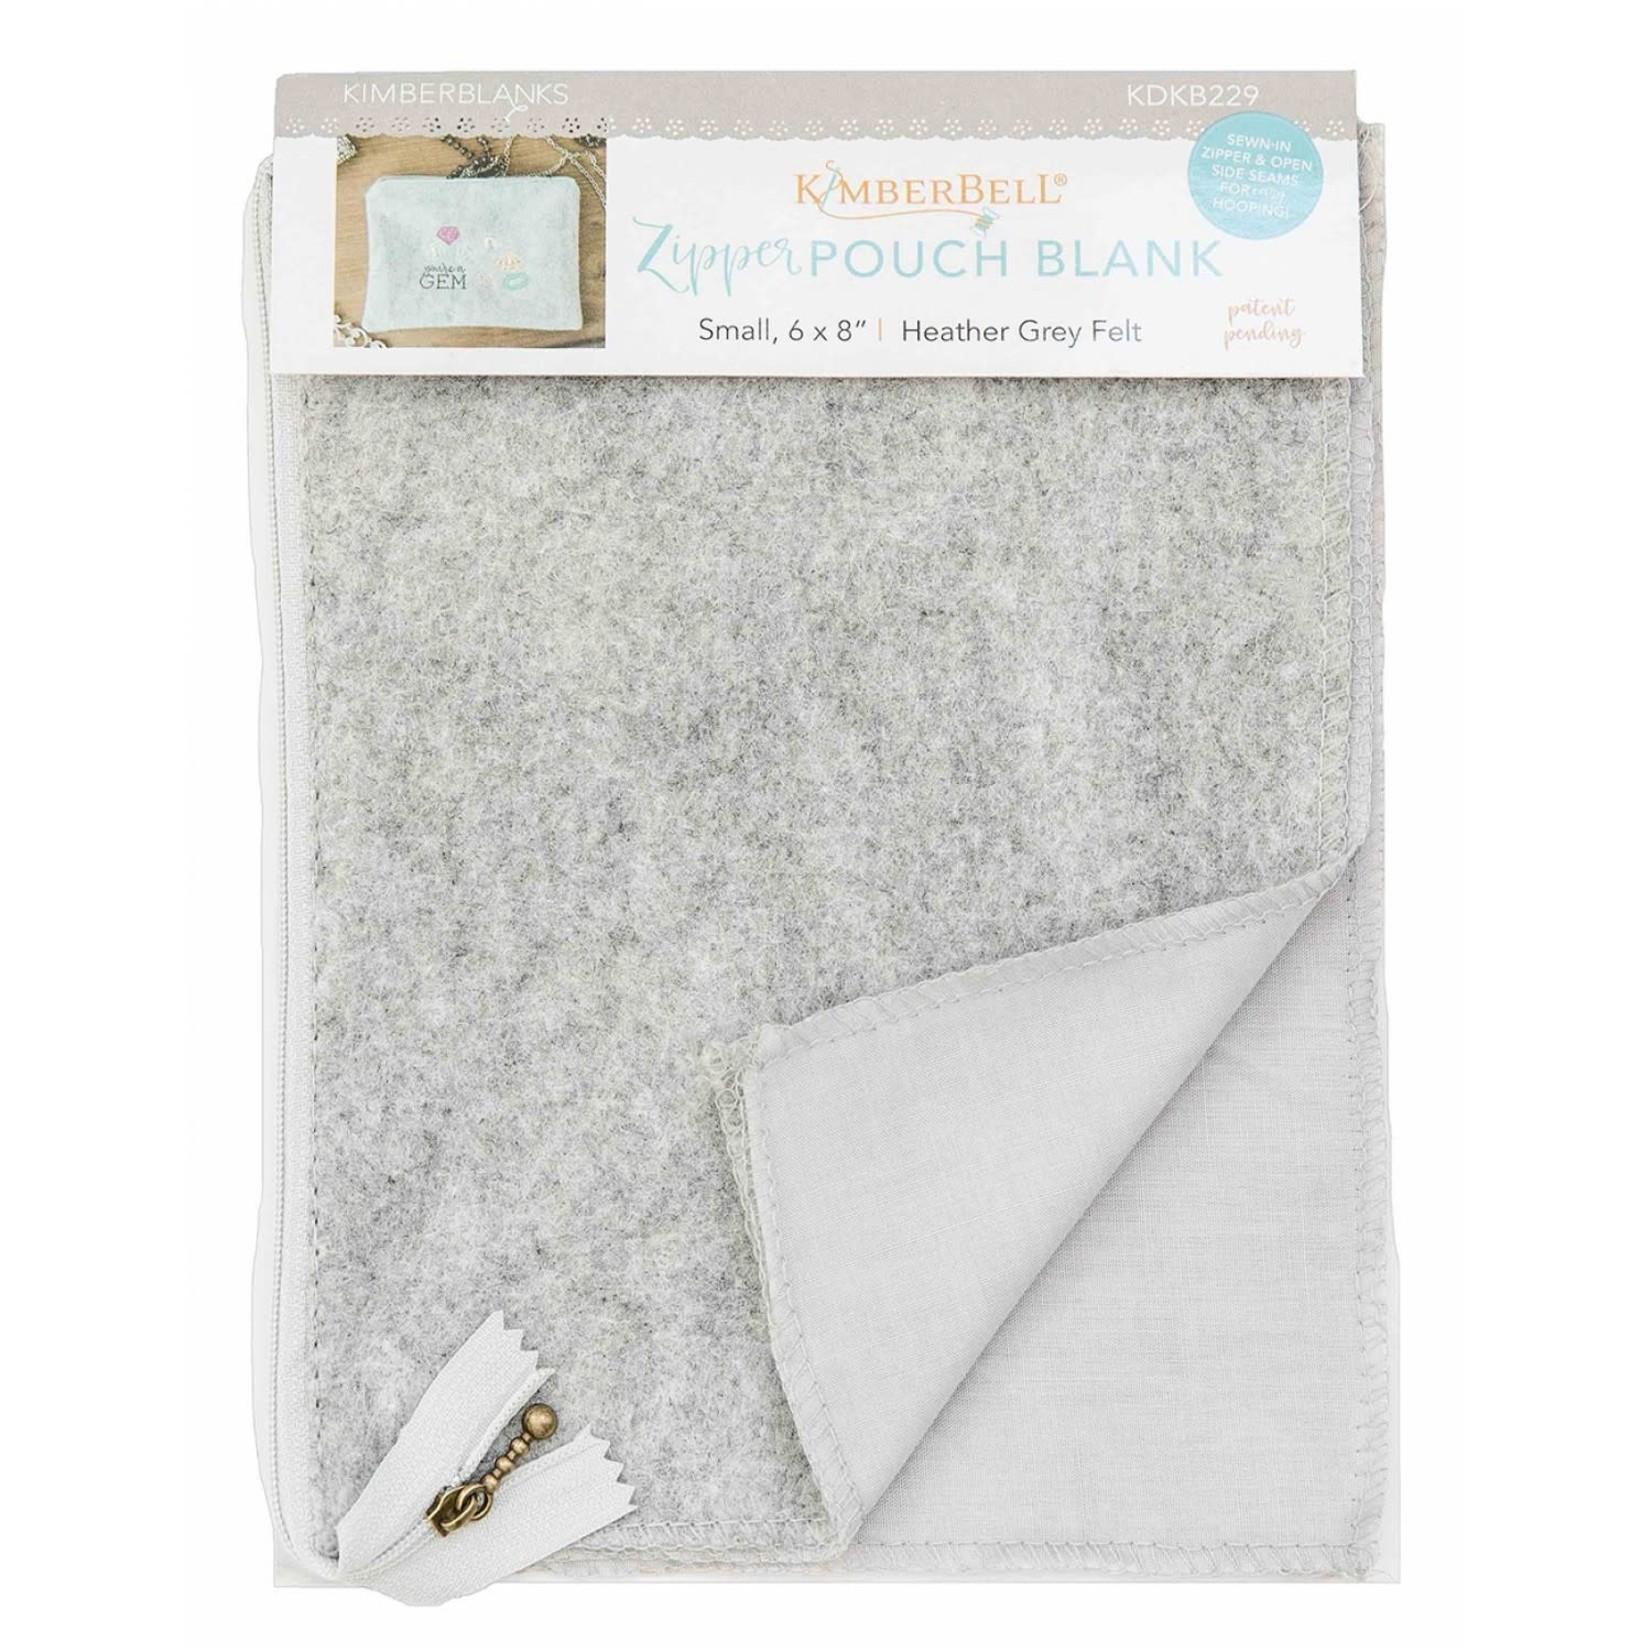 Kimberbell Designs Heather Gray Felt Zipper Pouch Blank, Small